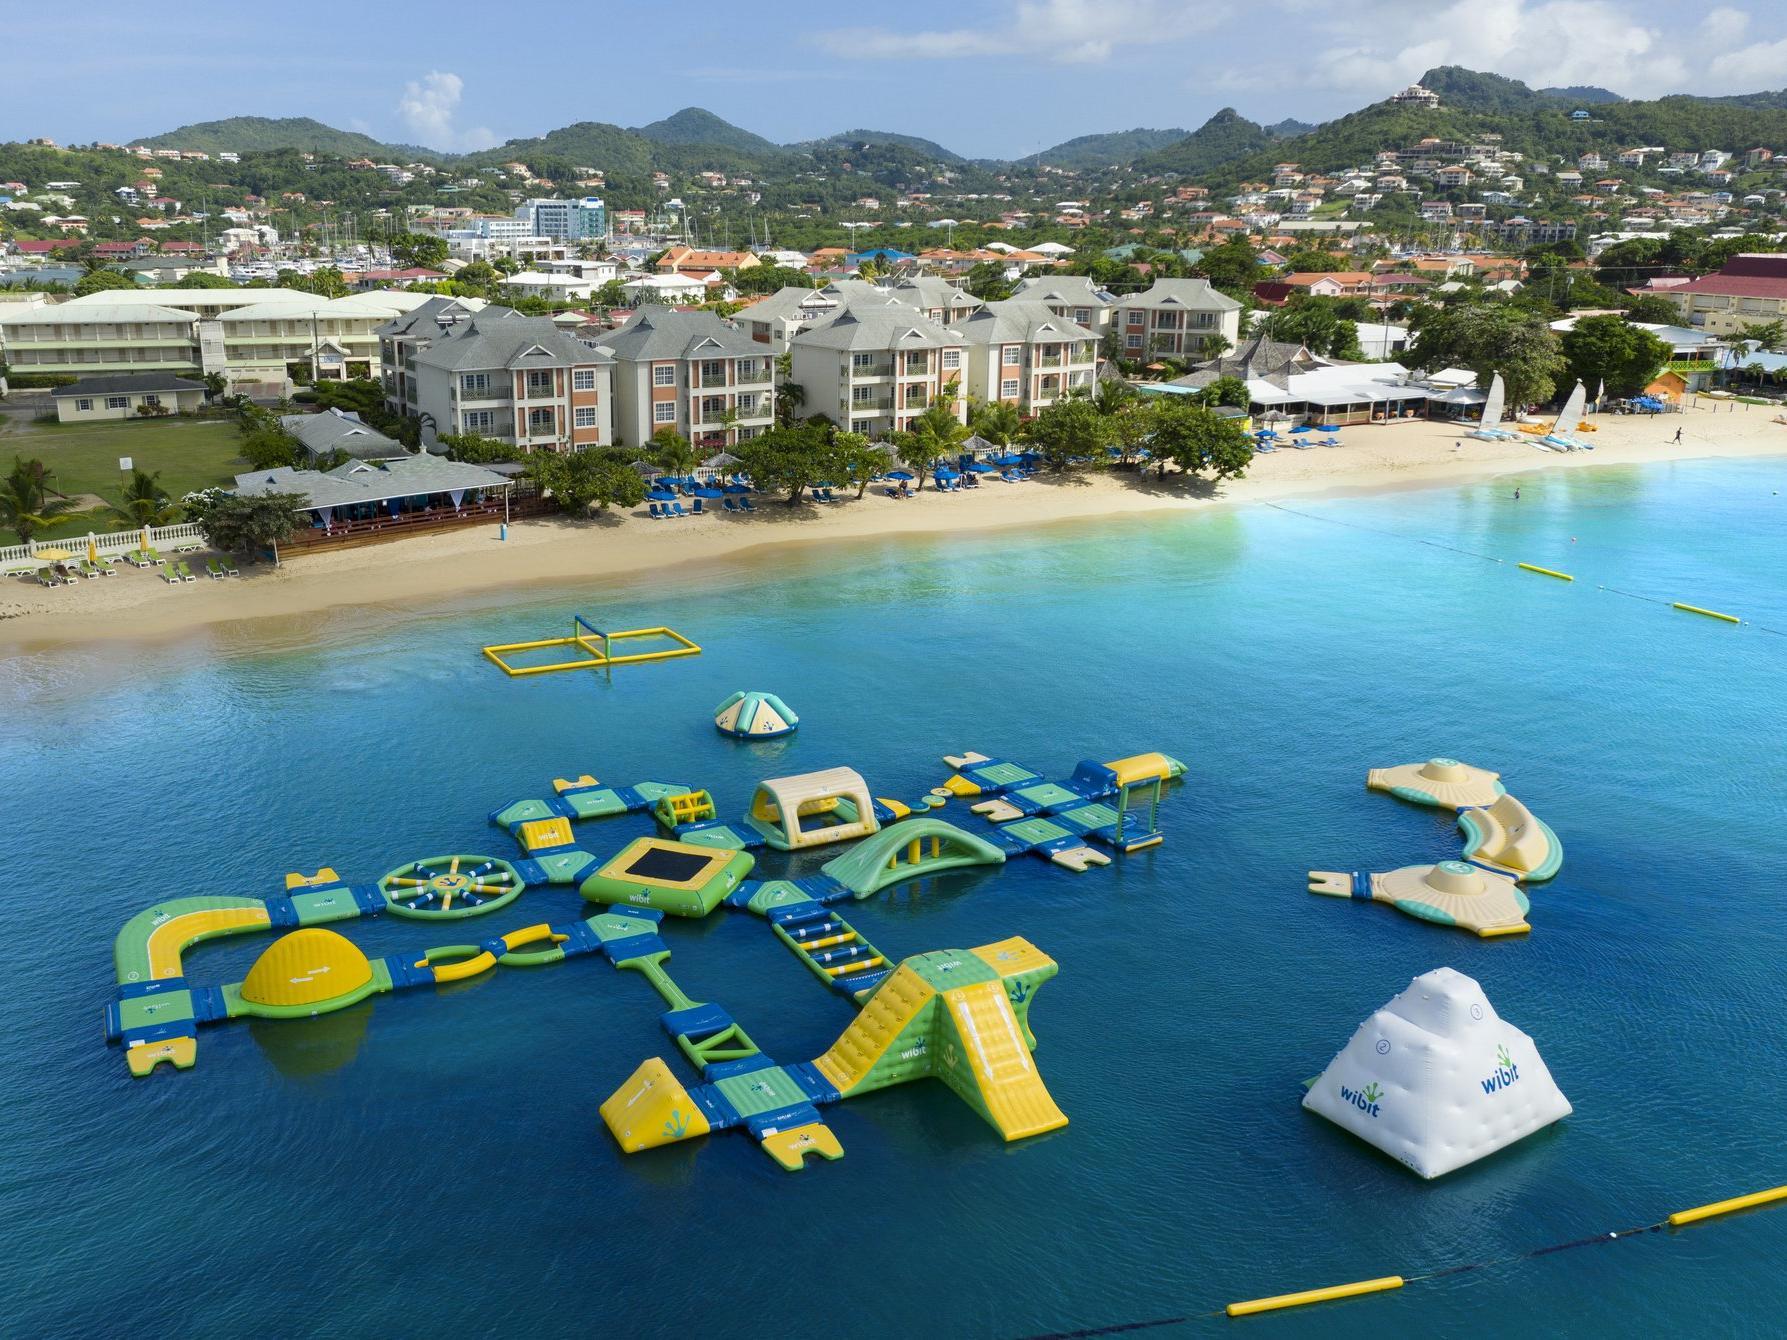 splash park aerial view